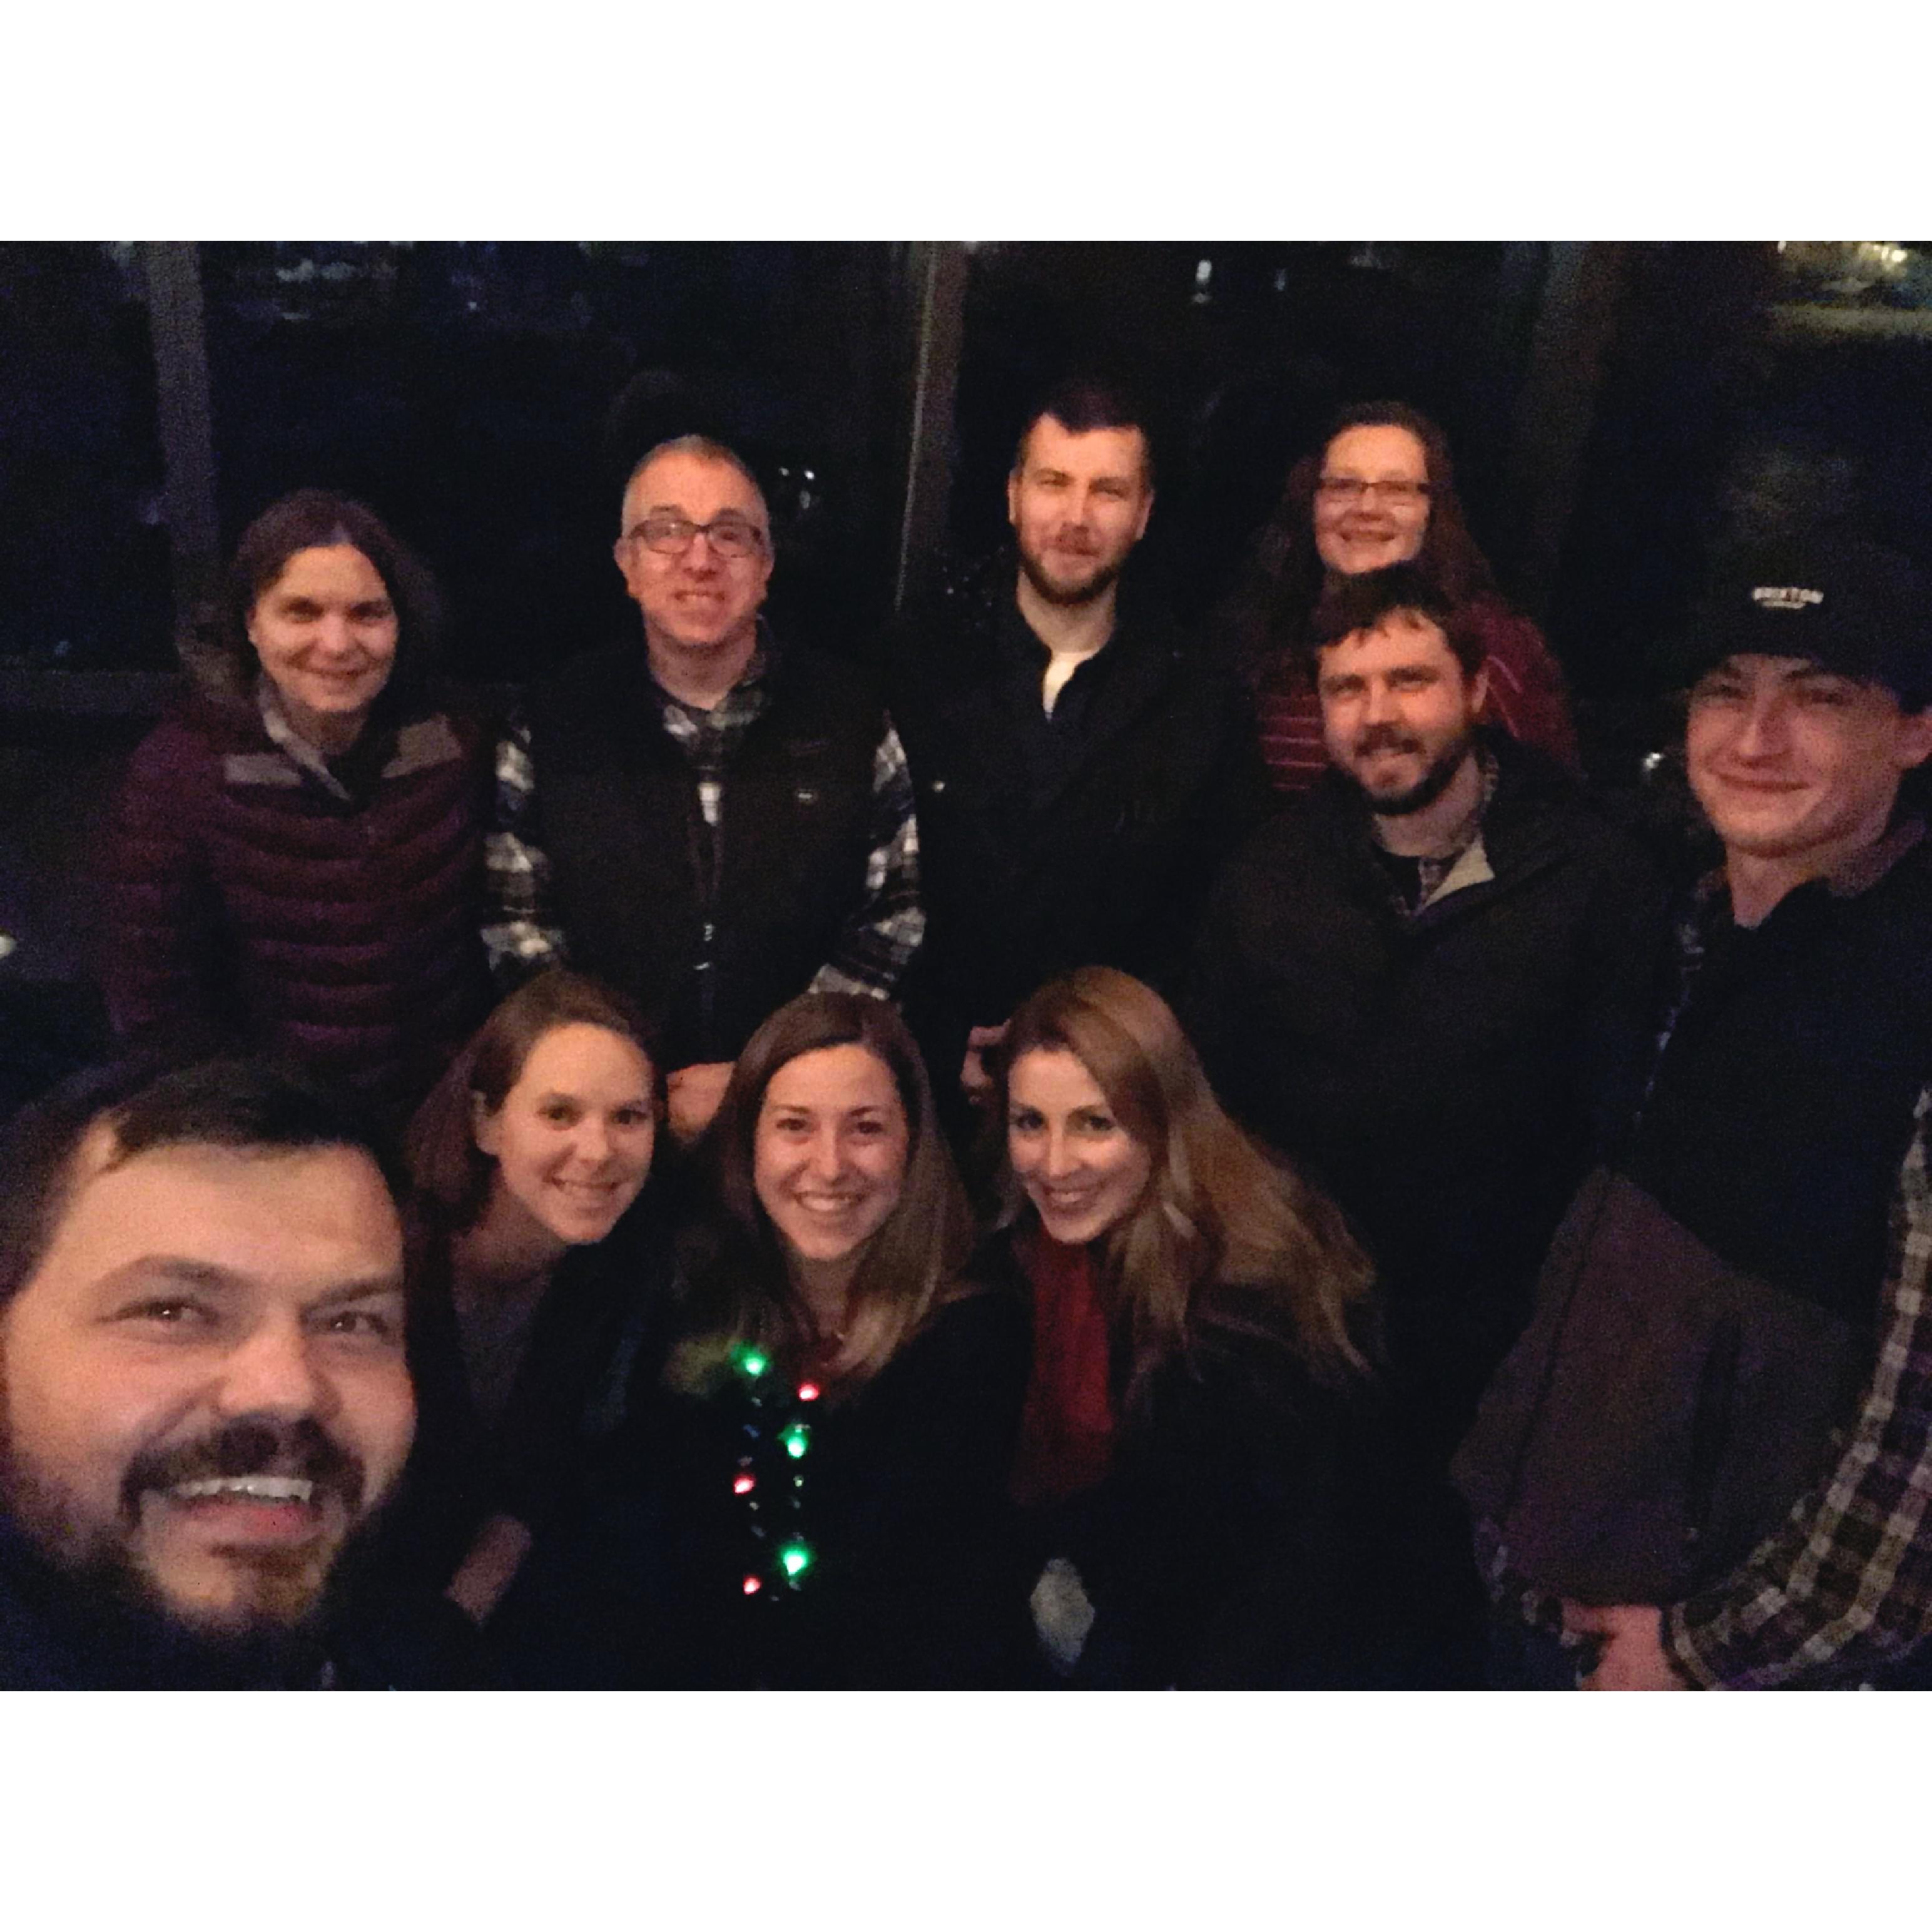 Company Christmas Dinner